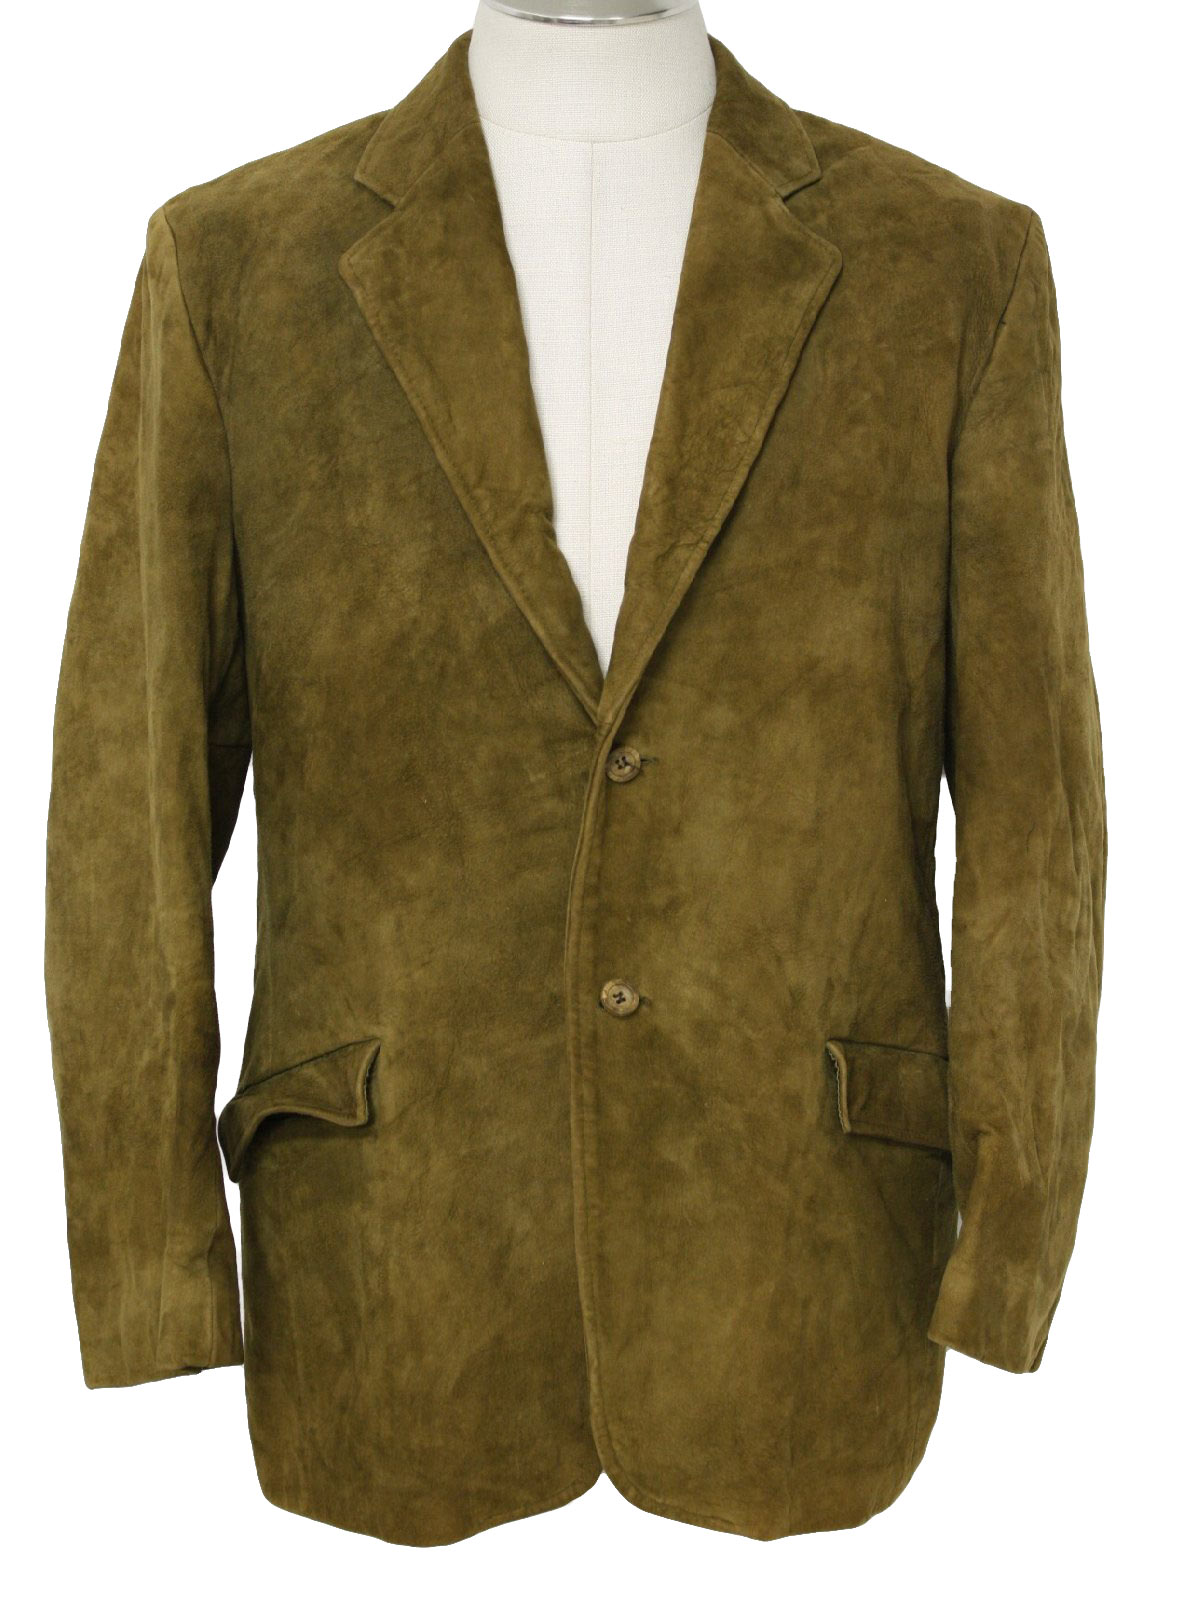 Vintage Robert Lewis 1970s Leather Jacket 70s Robert